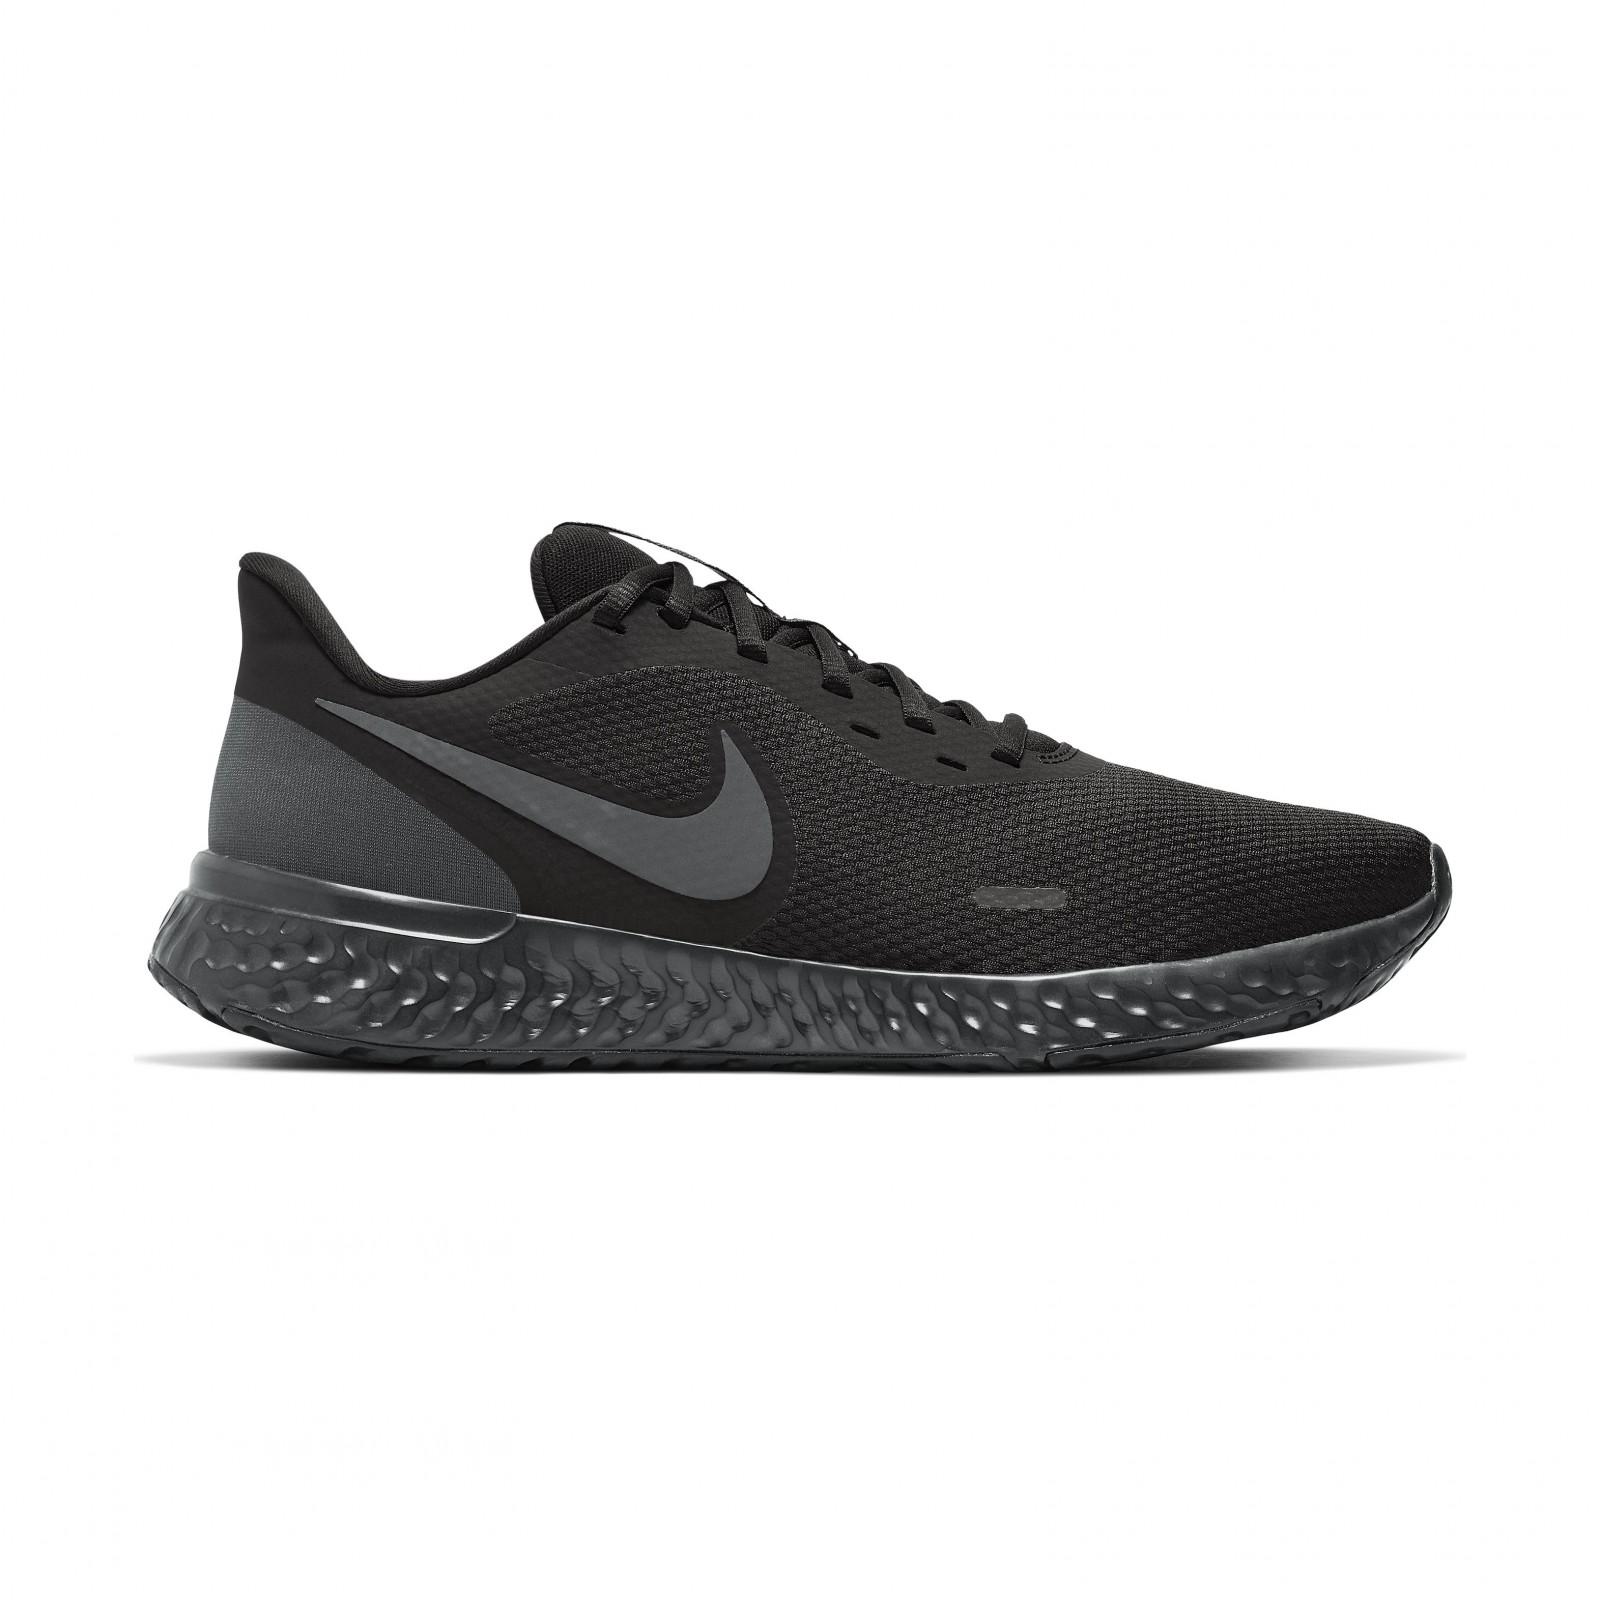 Nike revolution 5 BLACK/ANTHRACITE